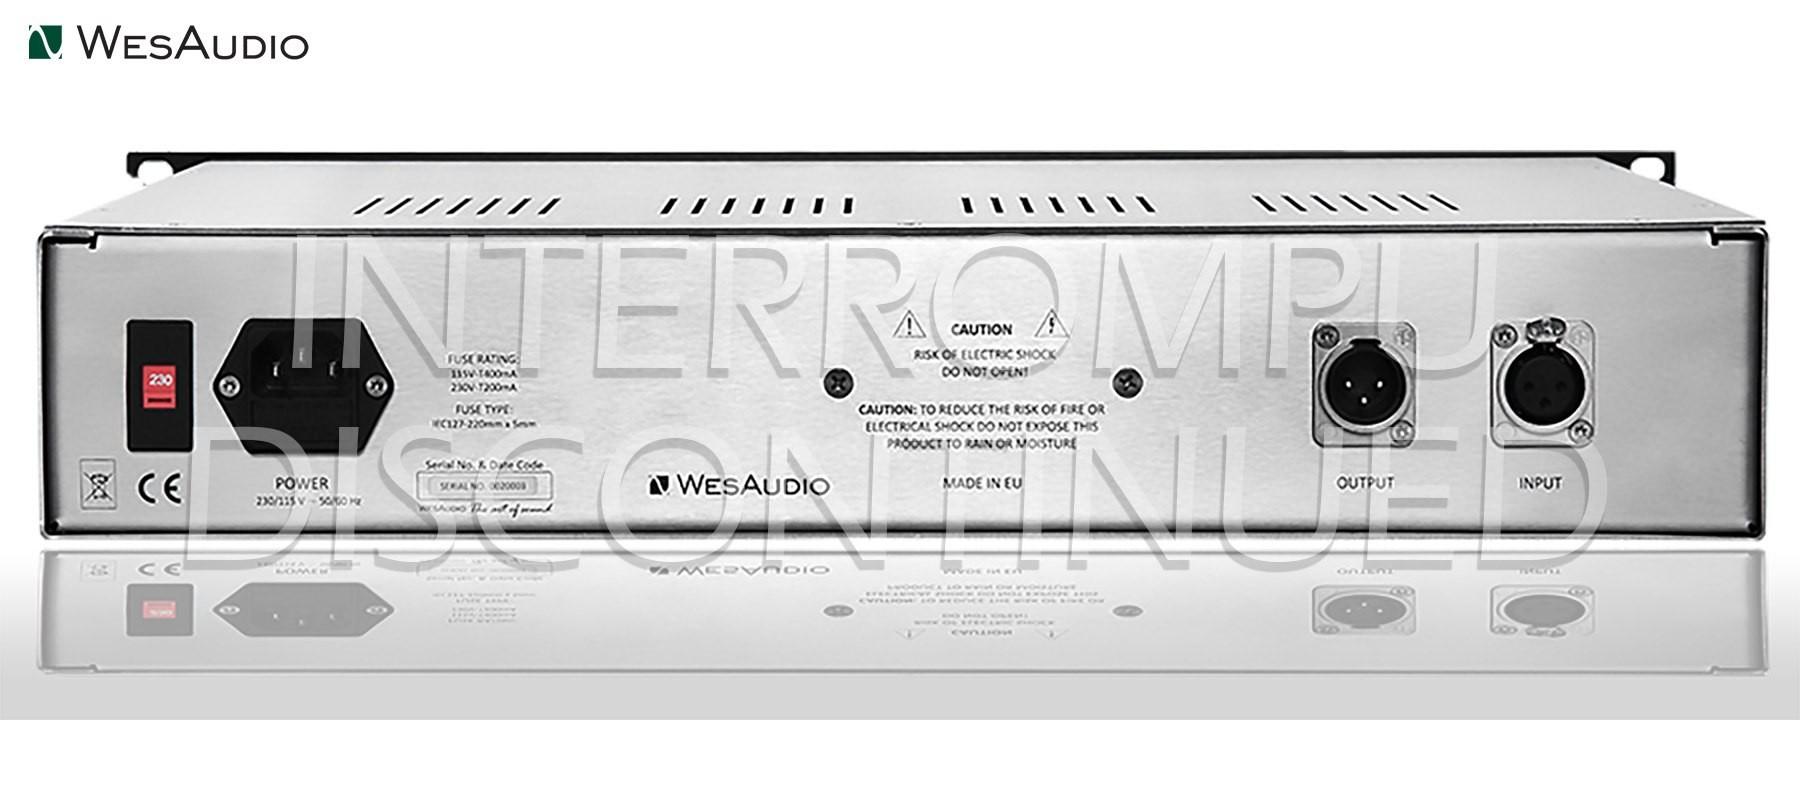 WesAudio LC-EQP